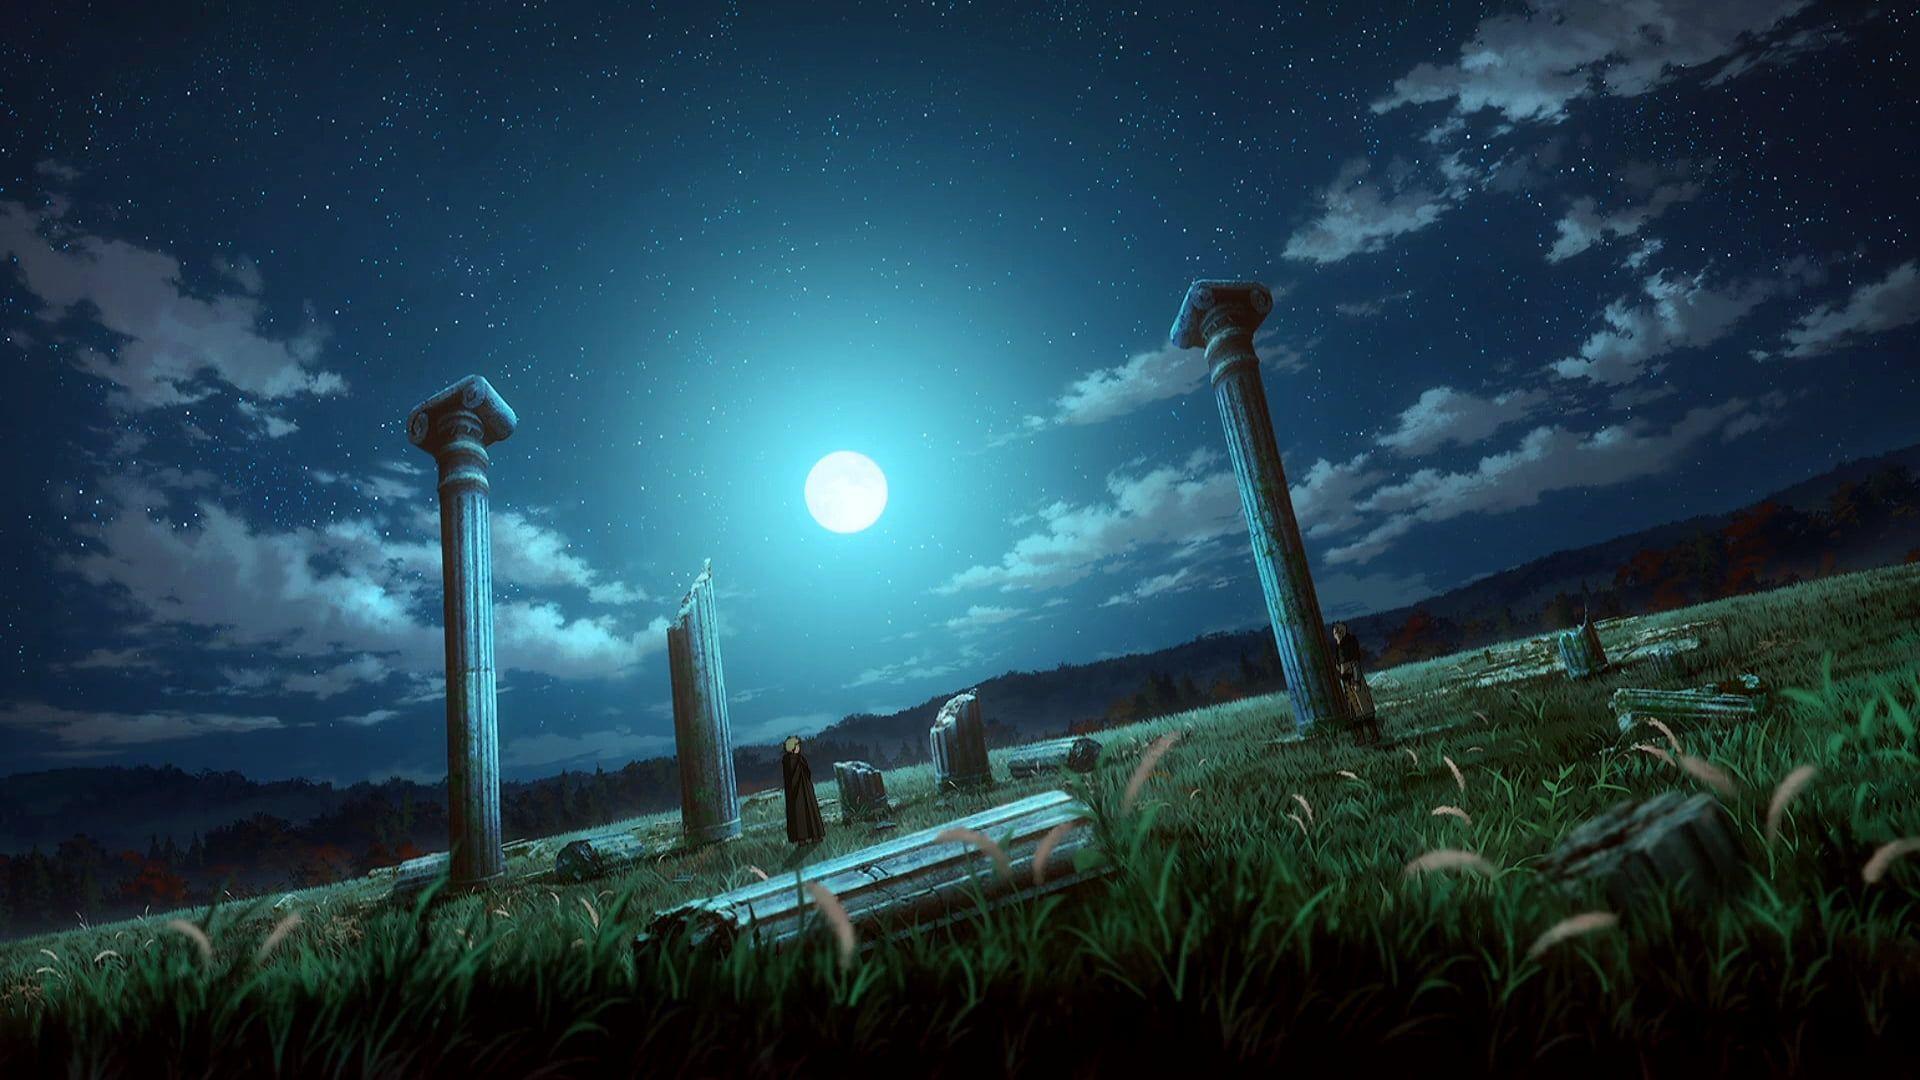 Vinland Saga Landscape Ruins Night Night Sky Moon Stars Clouds Roman In 2020 Night Sky Moon Vinland Saga Night Skies